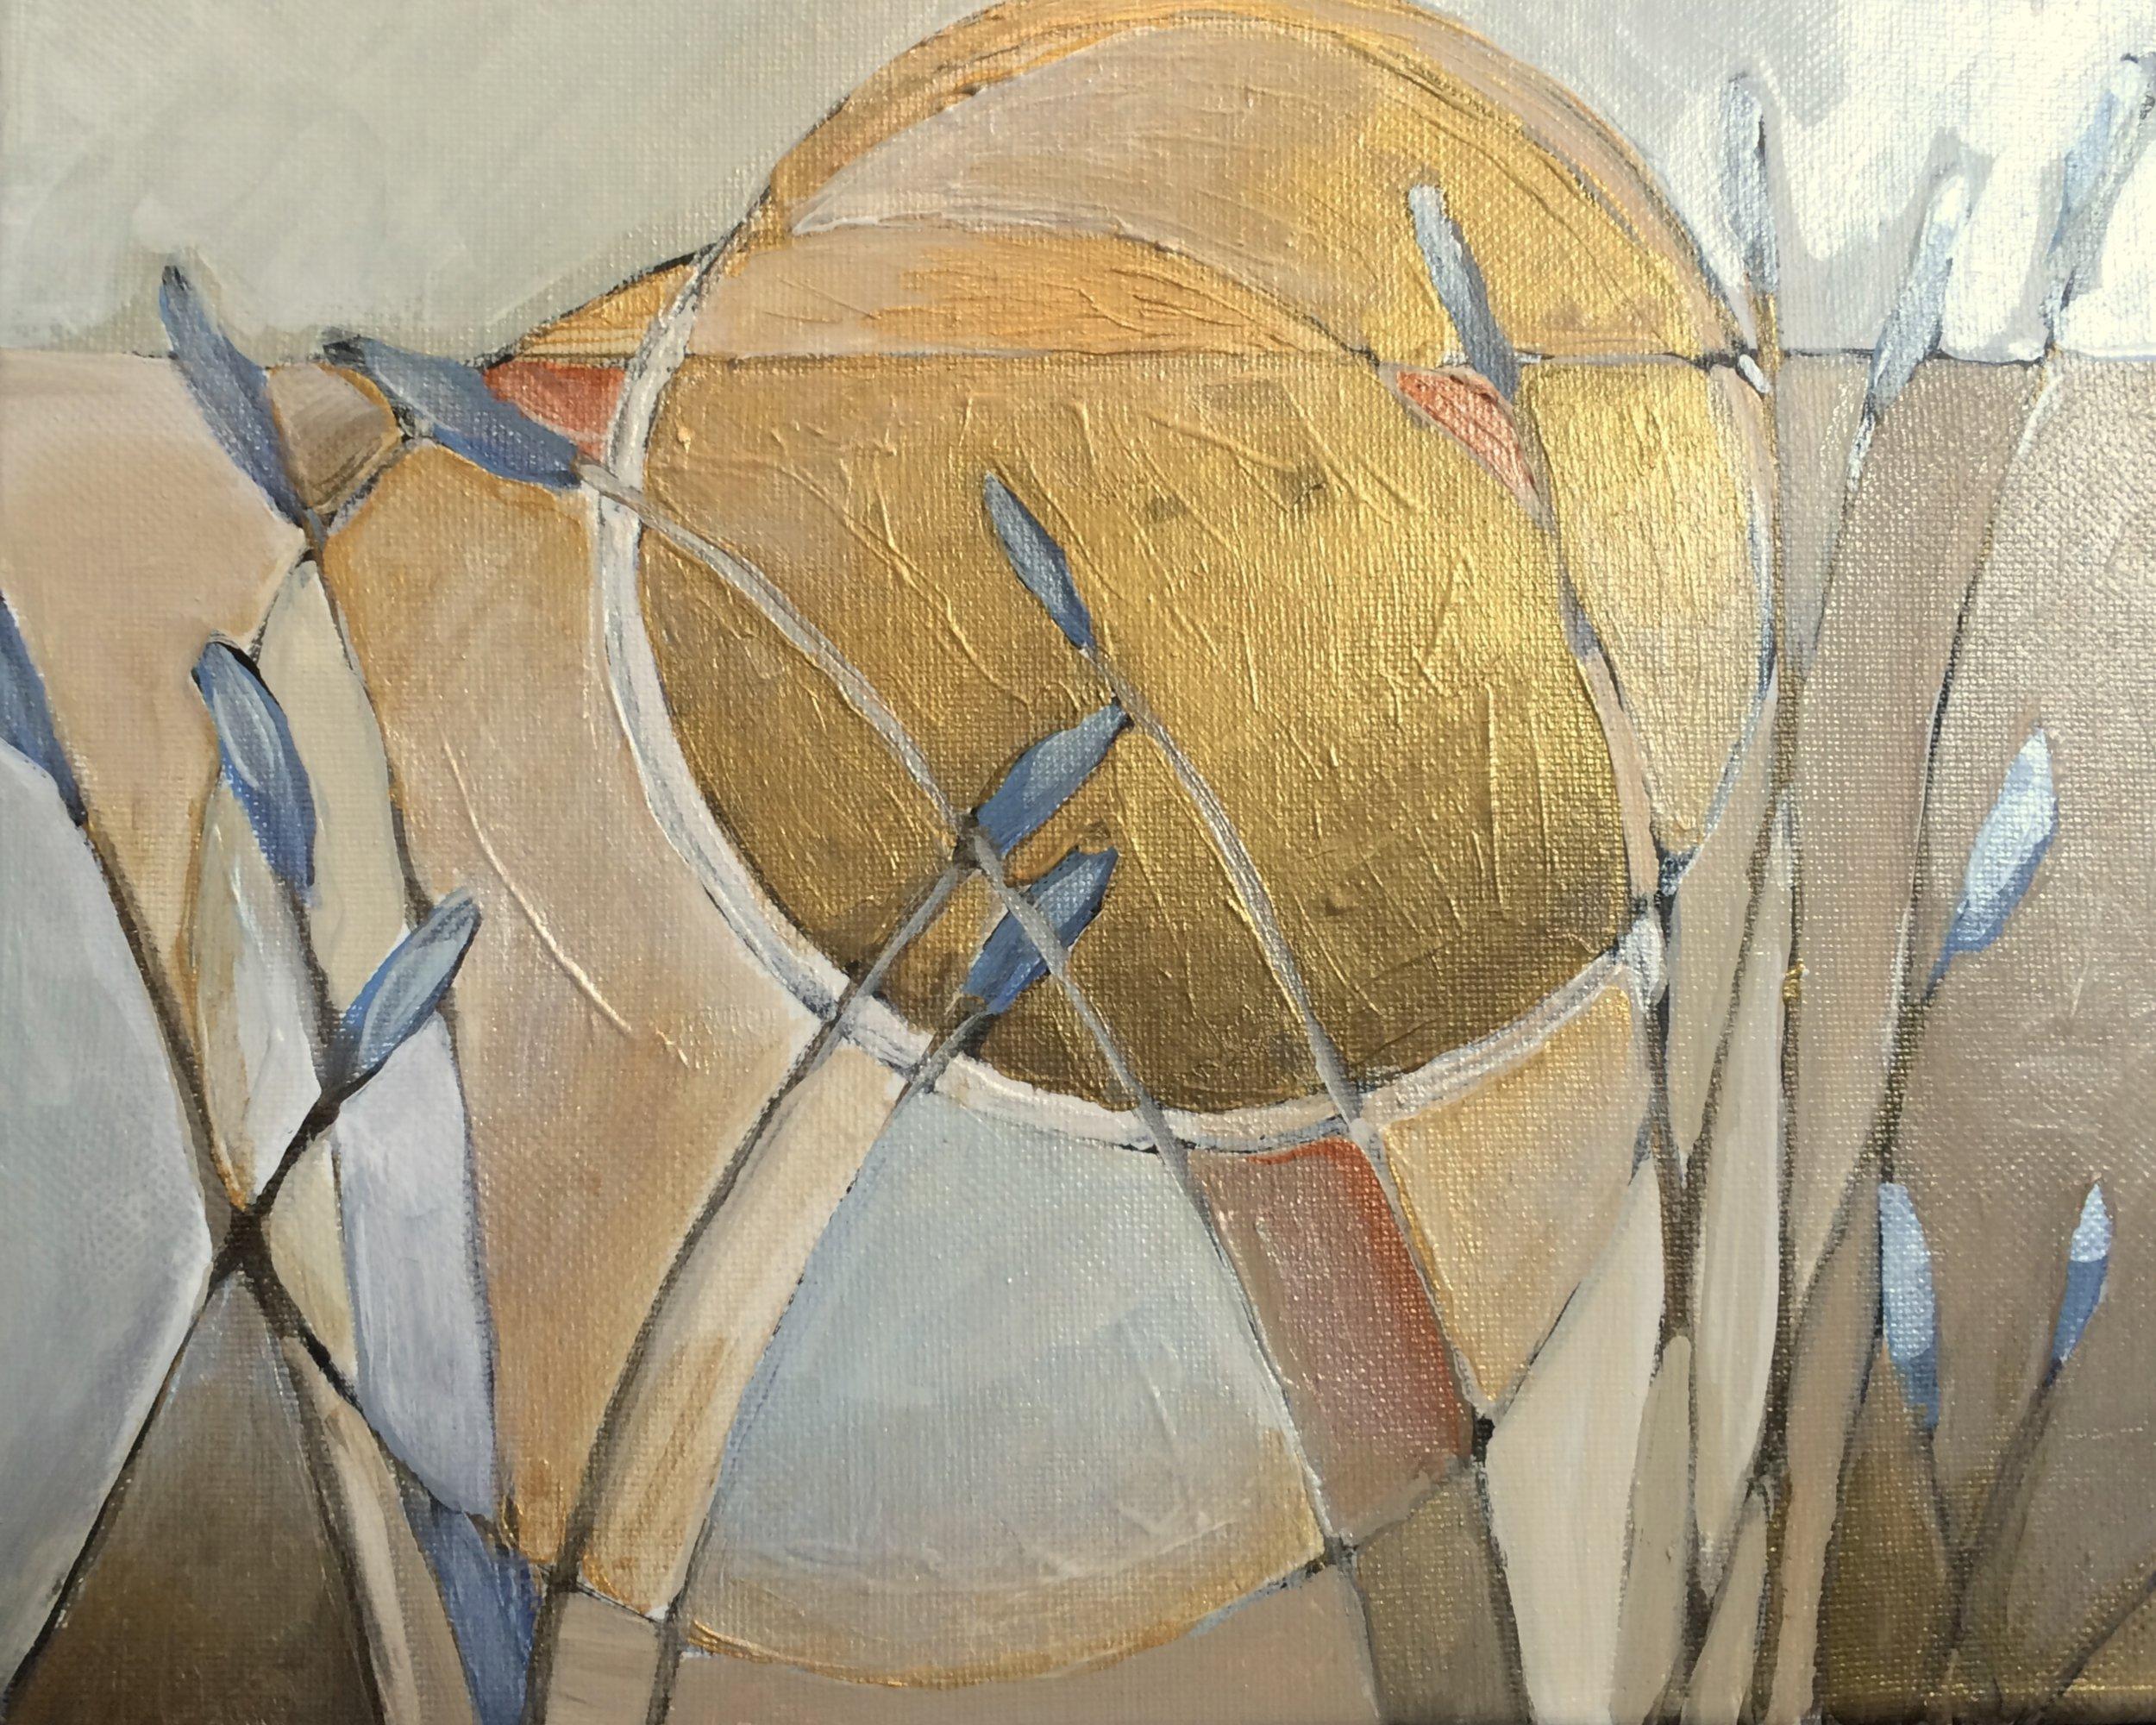 Beneath the Sunrise - Jill Van Sickle